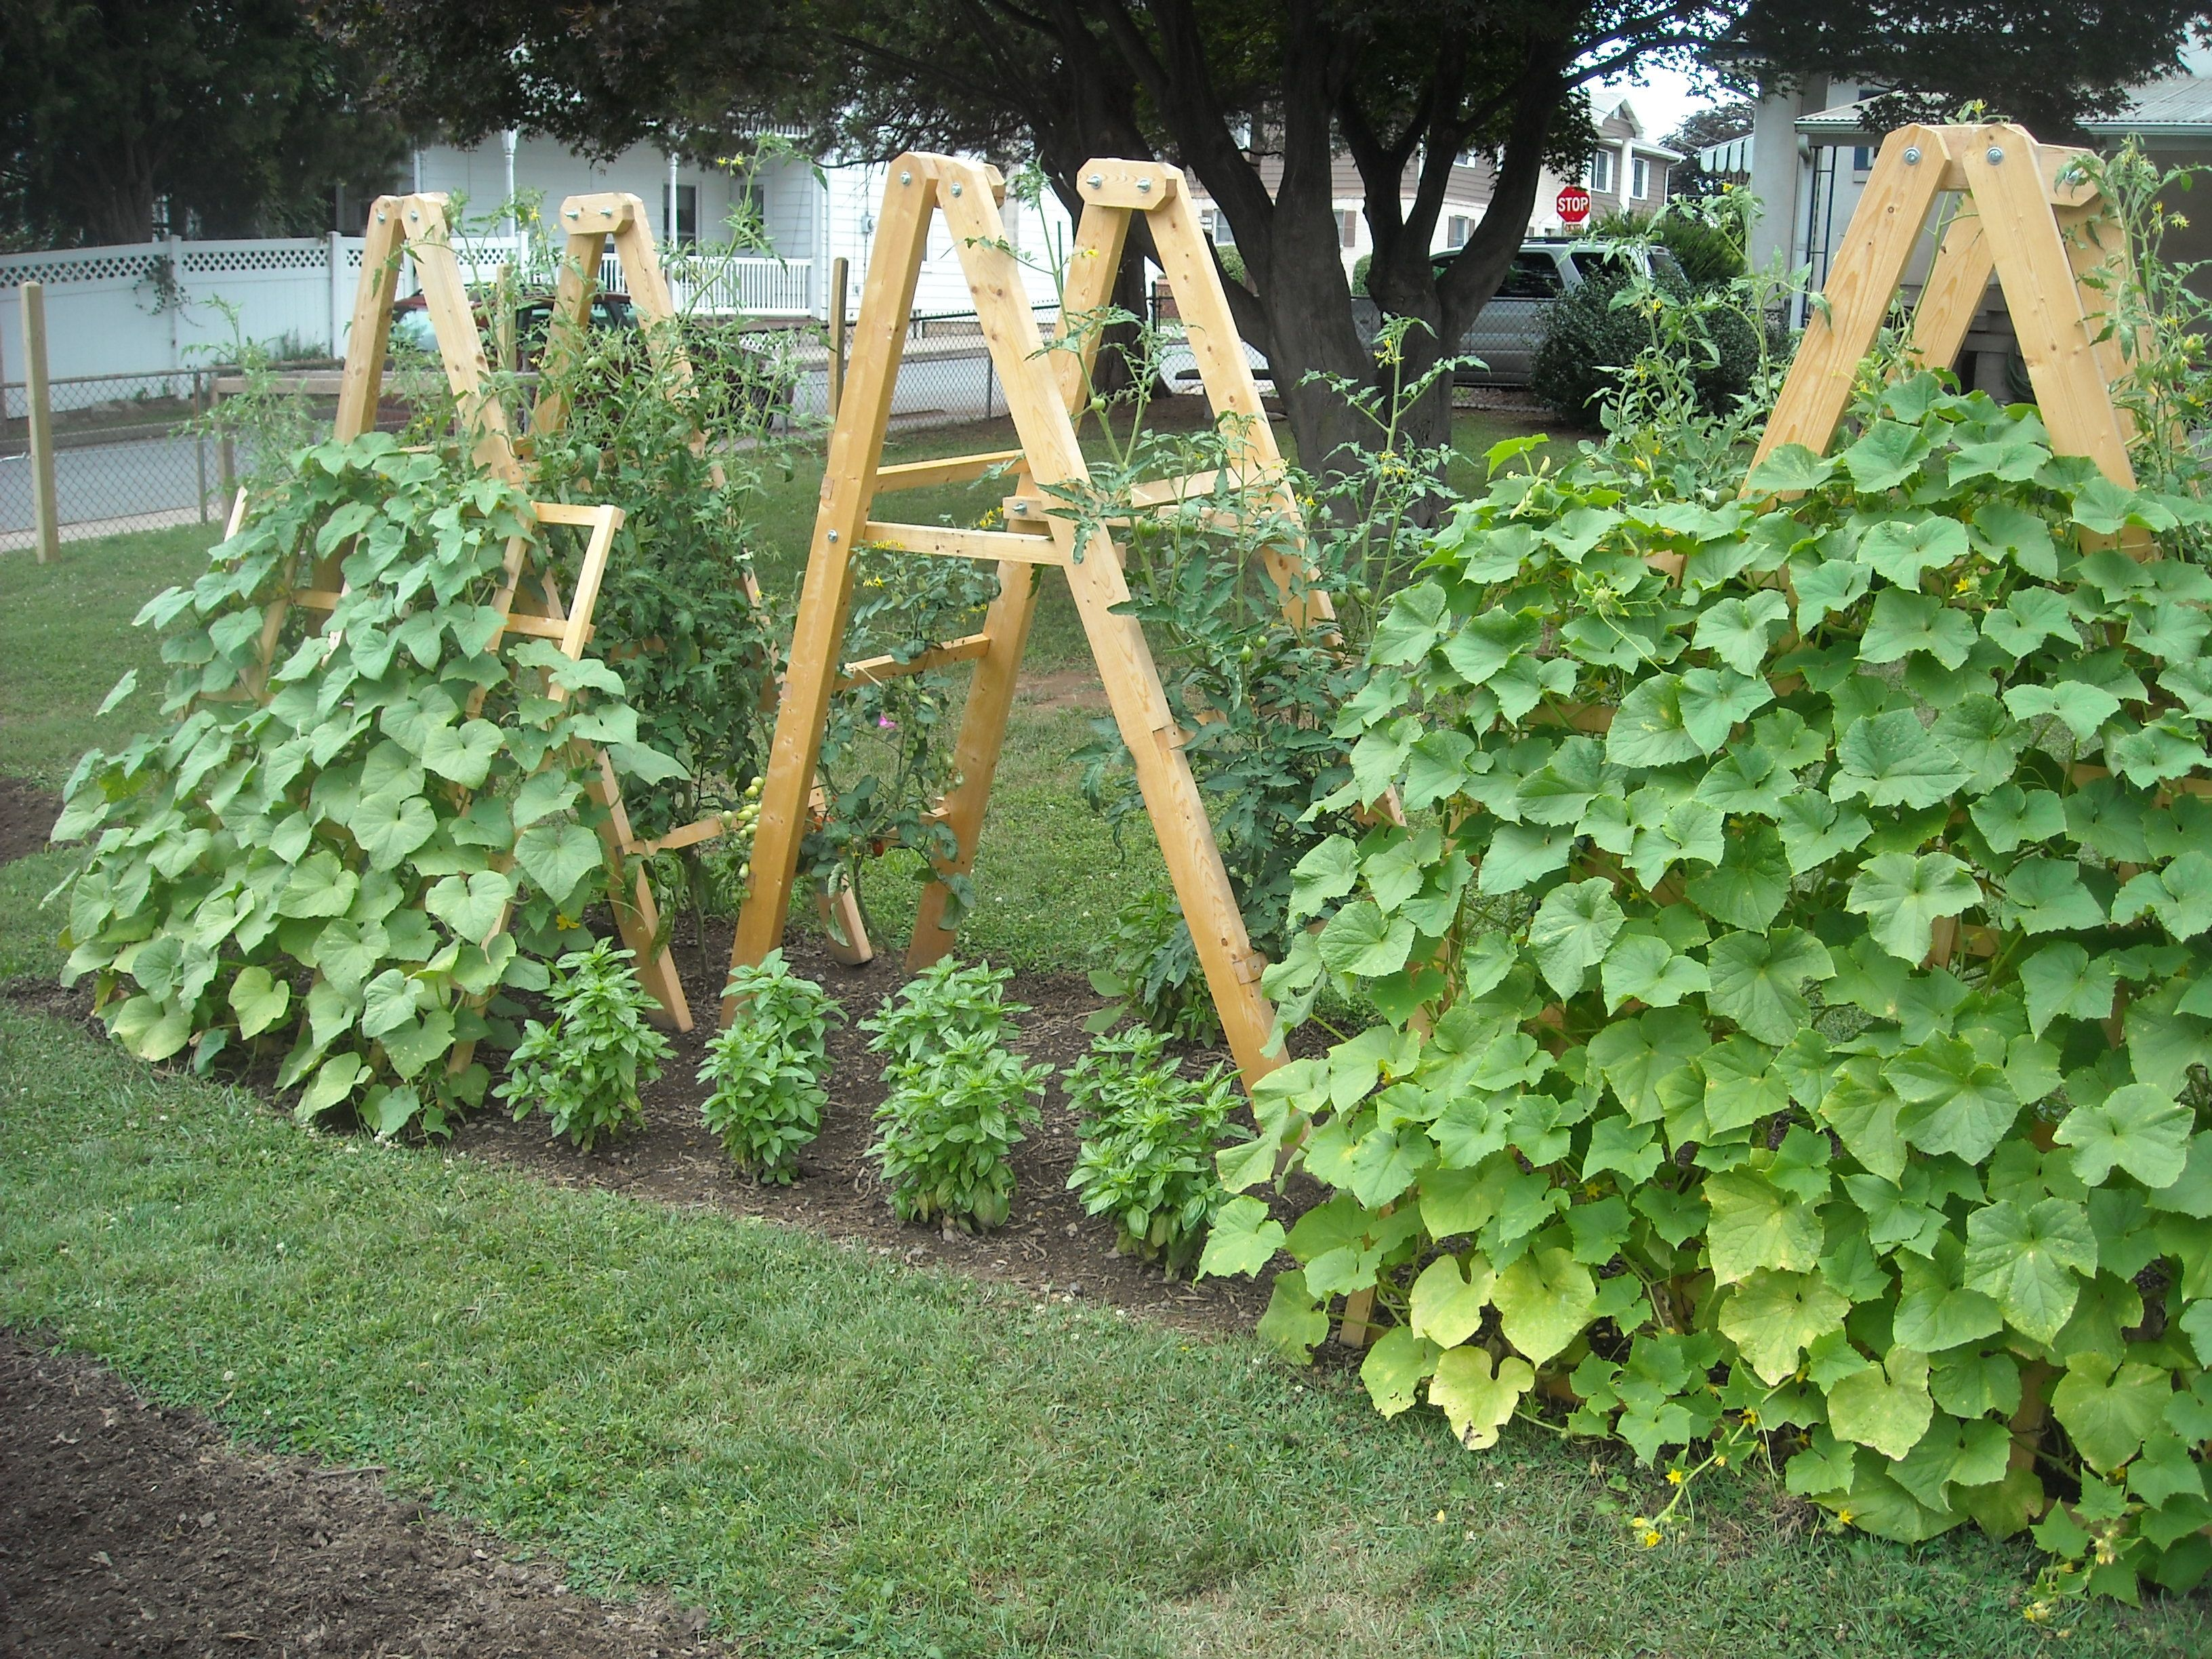 Veggie garden trellis ideas trellis ideas for my garden for Garden trellis ideas